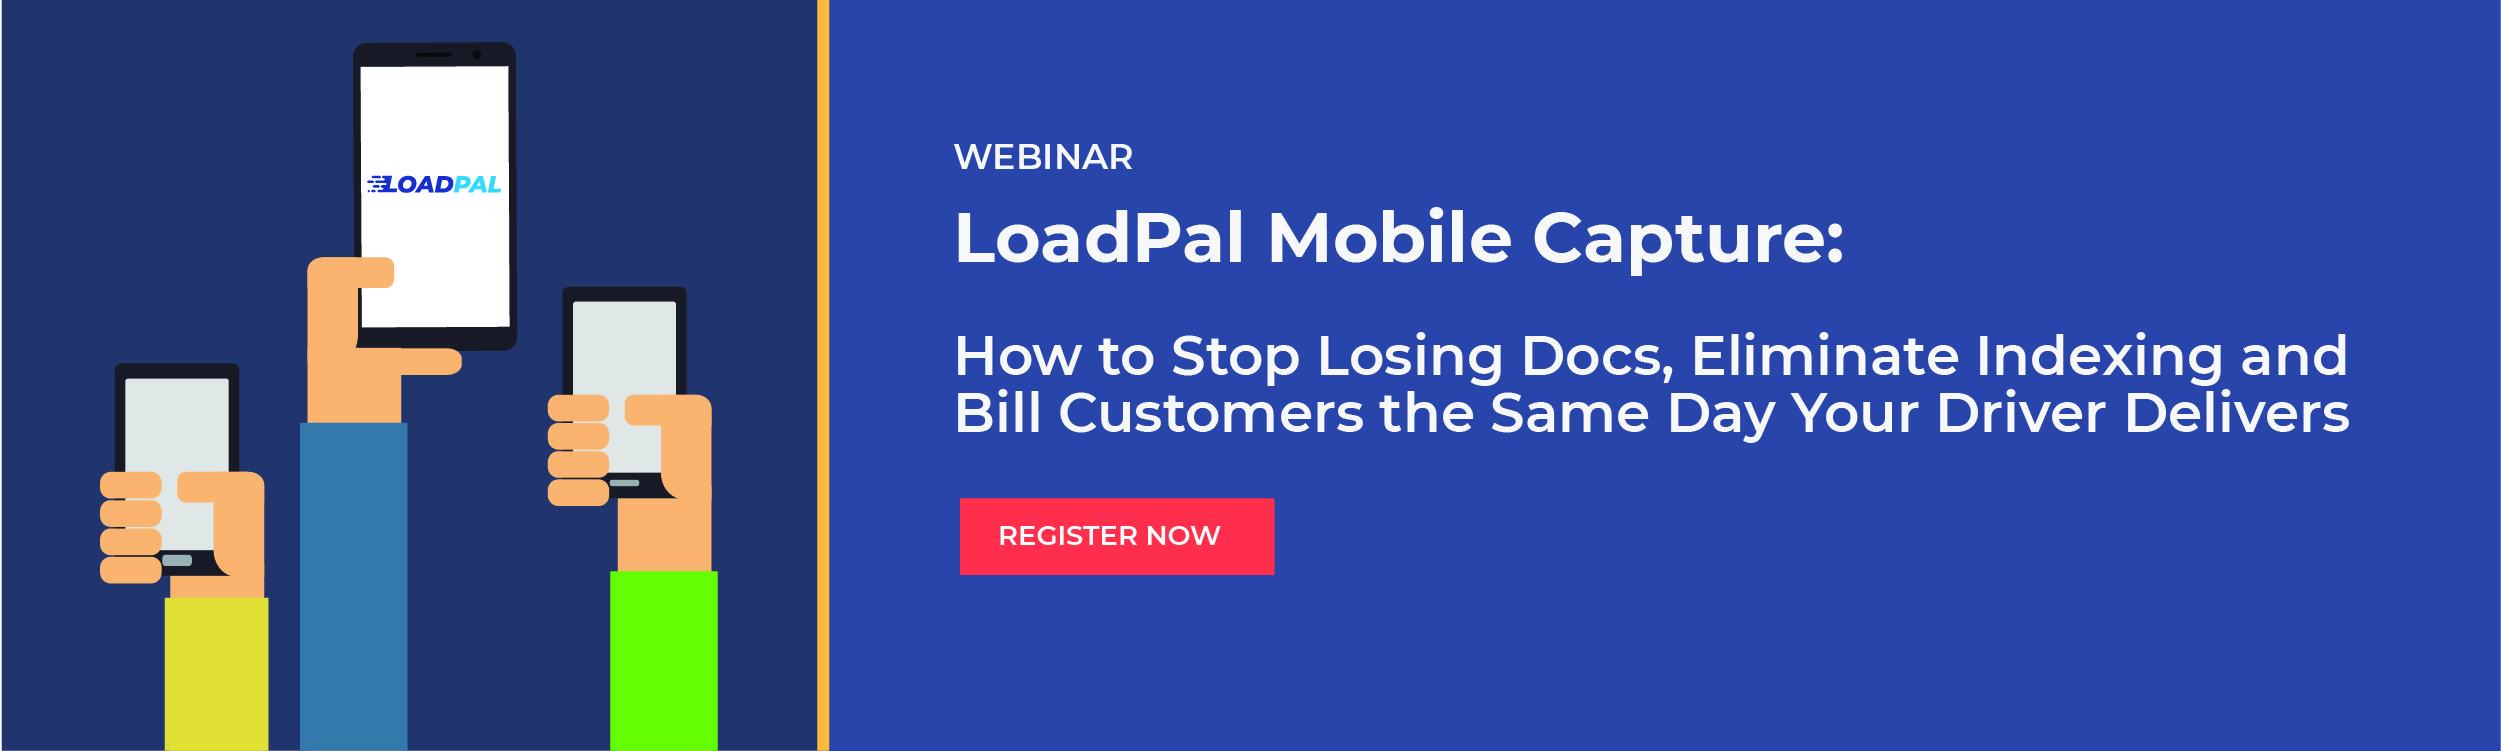 Webinar: LoadPal Mobile Capture